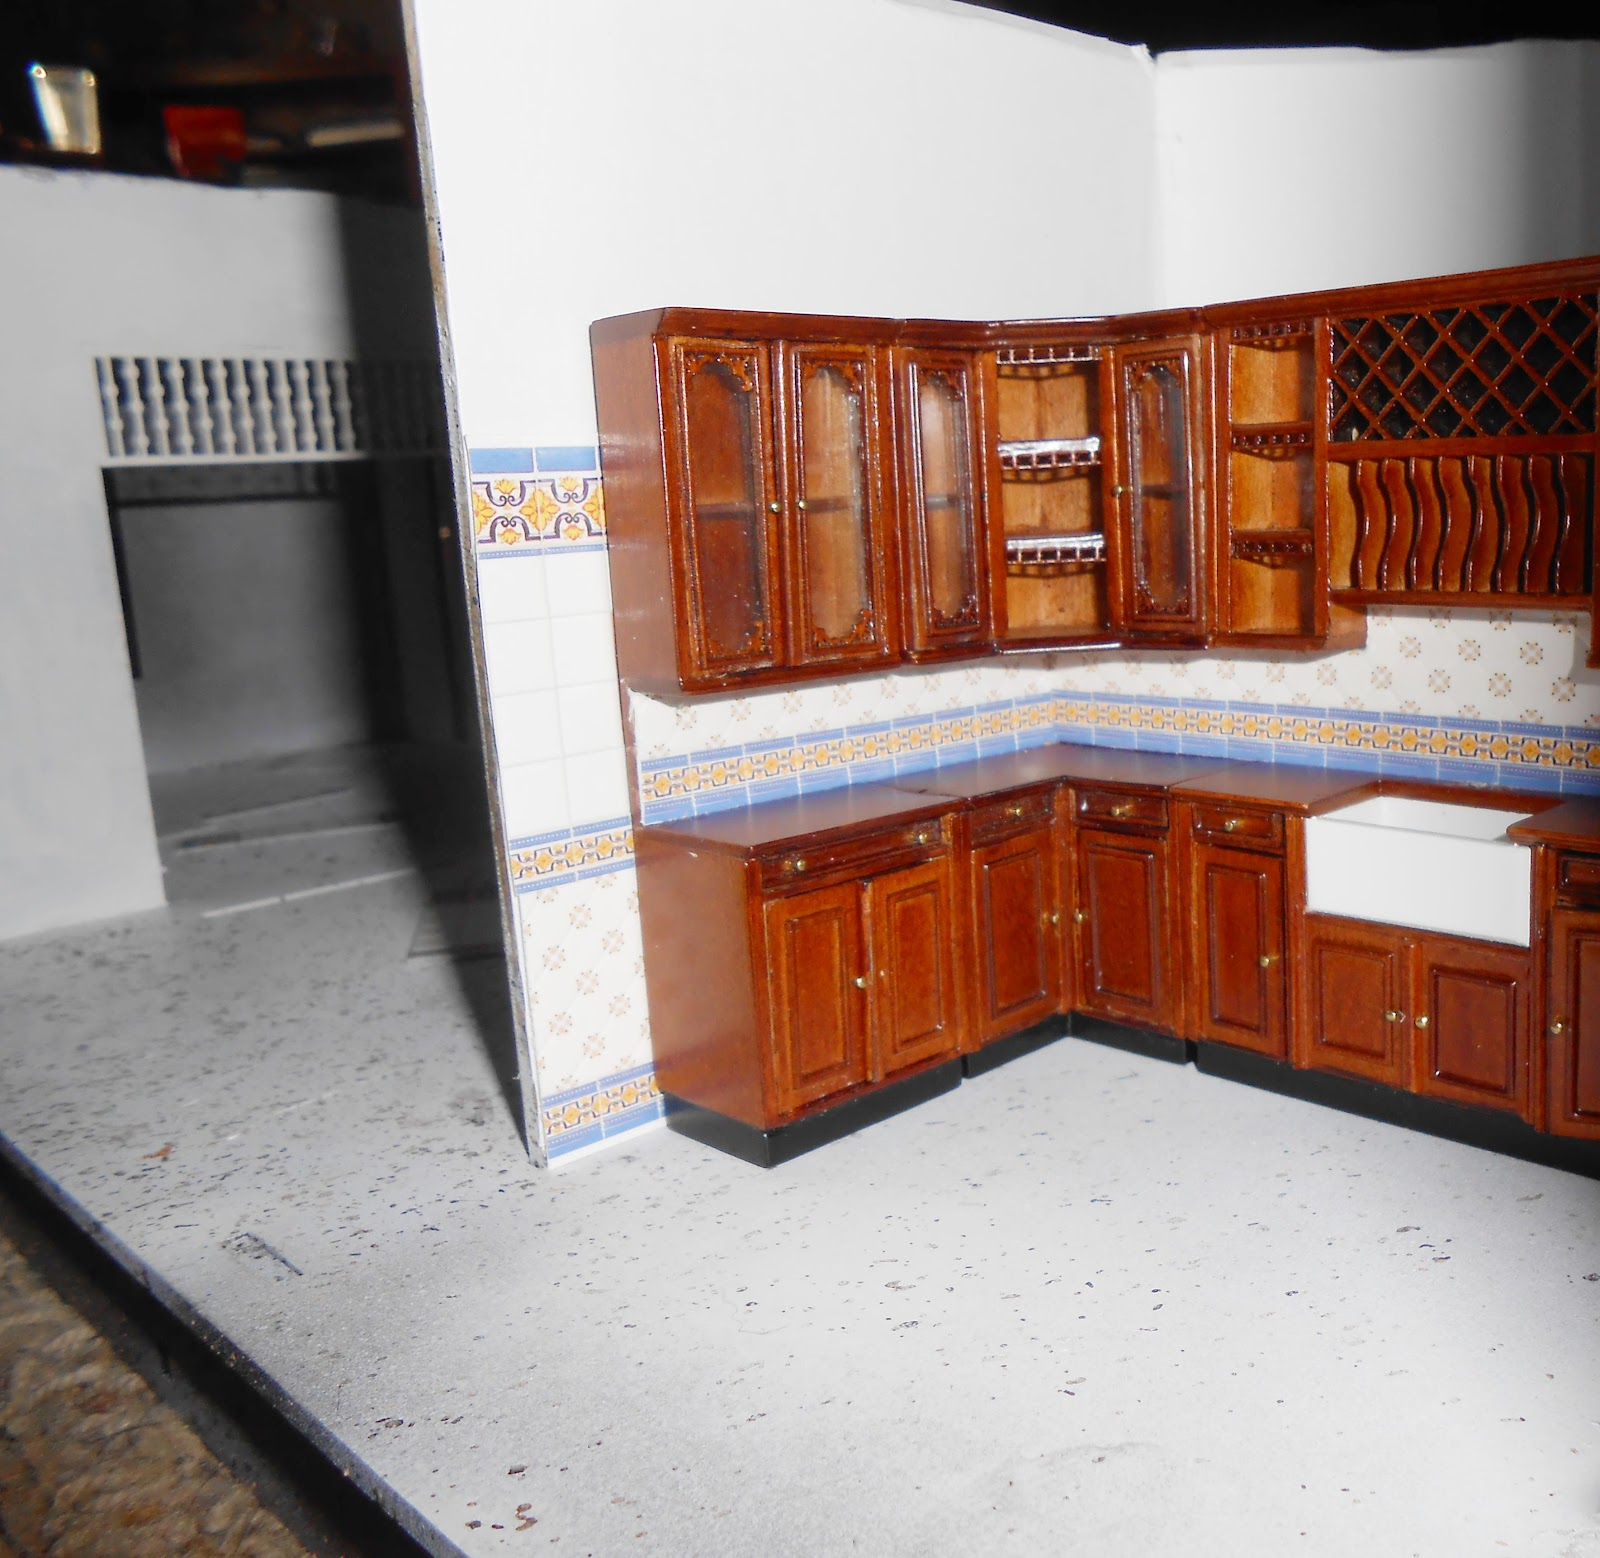 Honey, I Shrunk The House!: Bespaq Kitchen Update